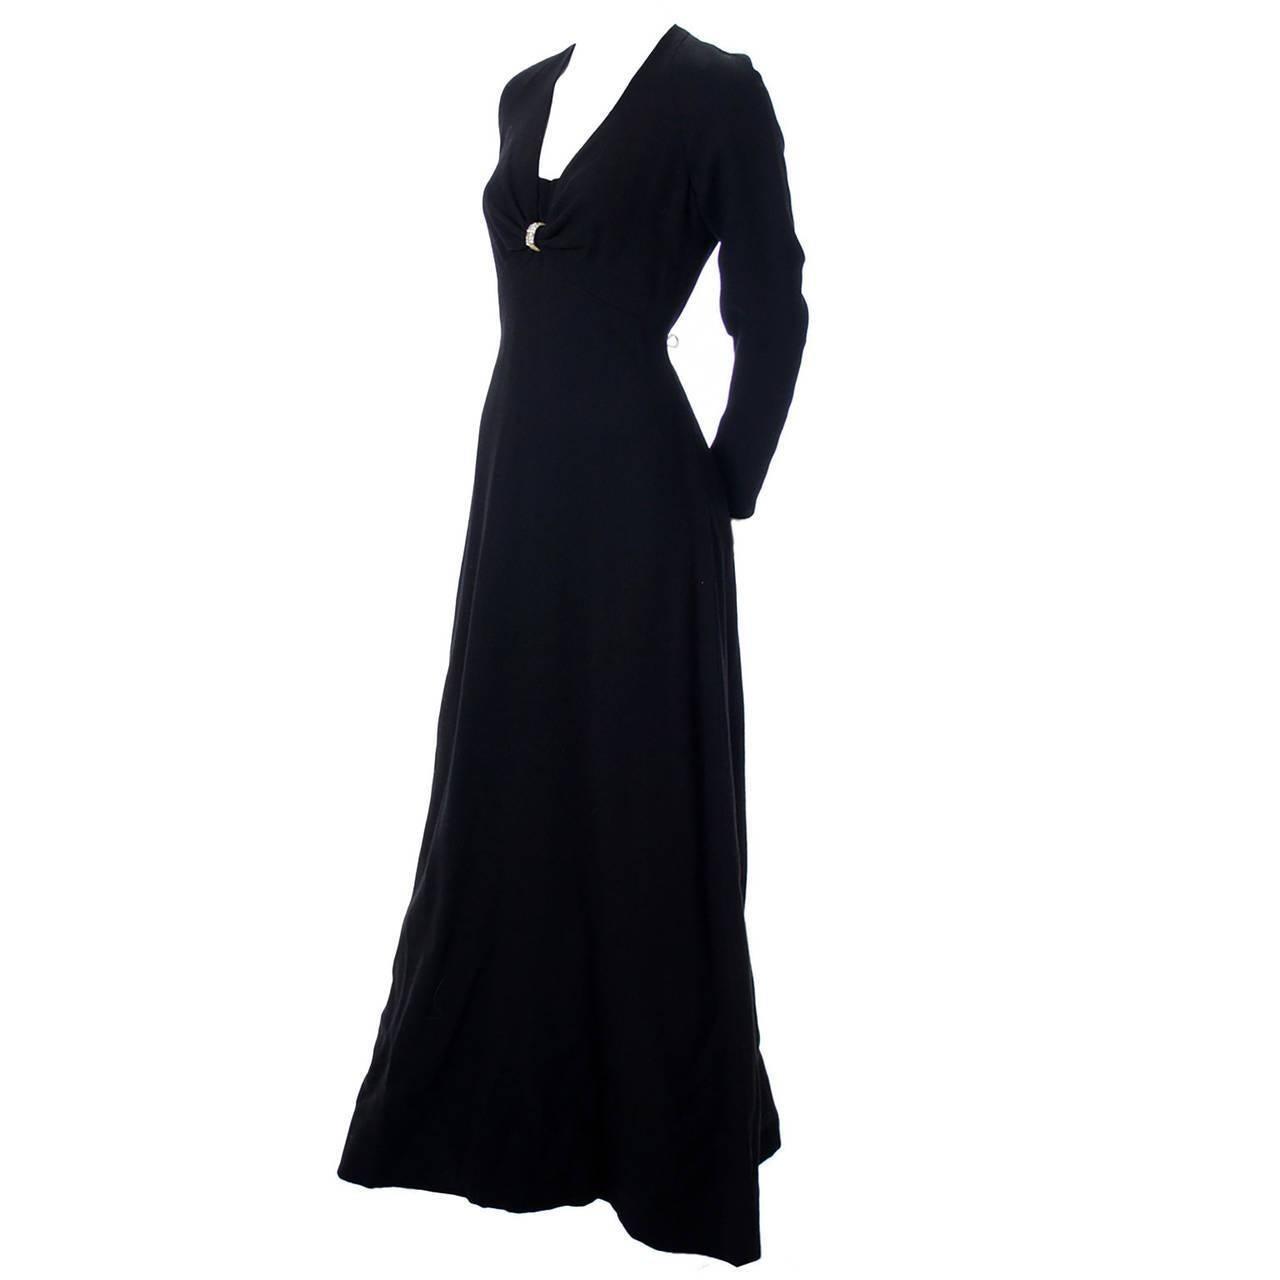 Nina Ricci Boutique Black Wool Crepe 1970s Vintage Maxi Dress With Rhinestones